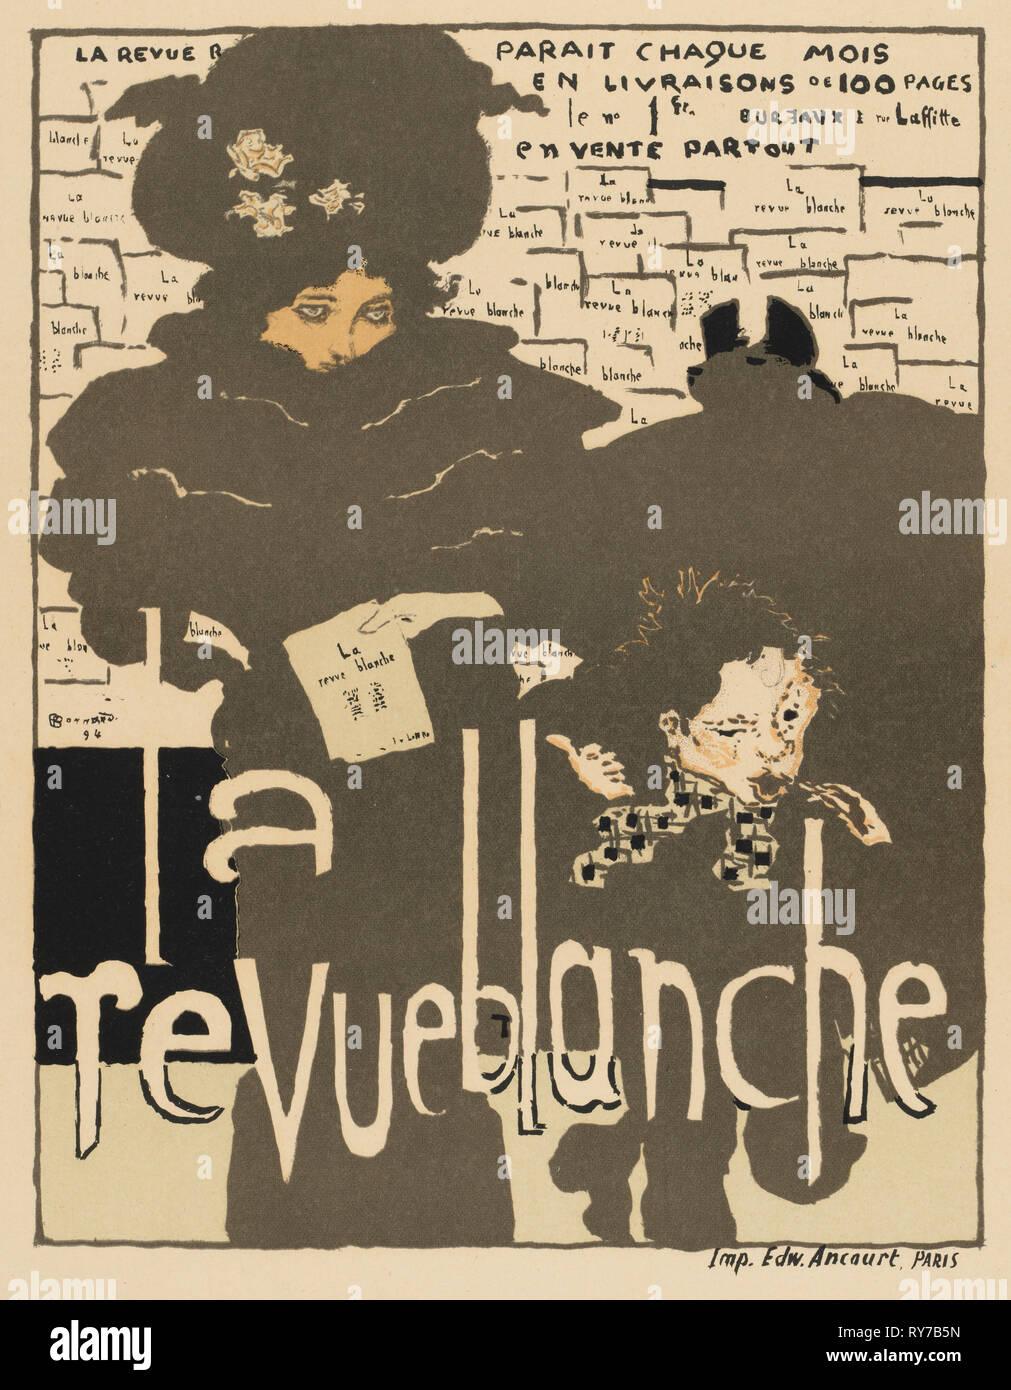 Masters of the Poster: Pl. 38, La Revue Blanche, 1894. Pierre Bonnard (French, 1867-1947), Ancourt, Paris. Color lithograph - Stock Image